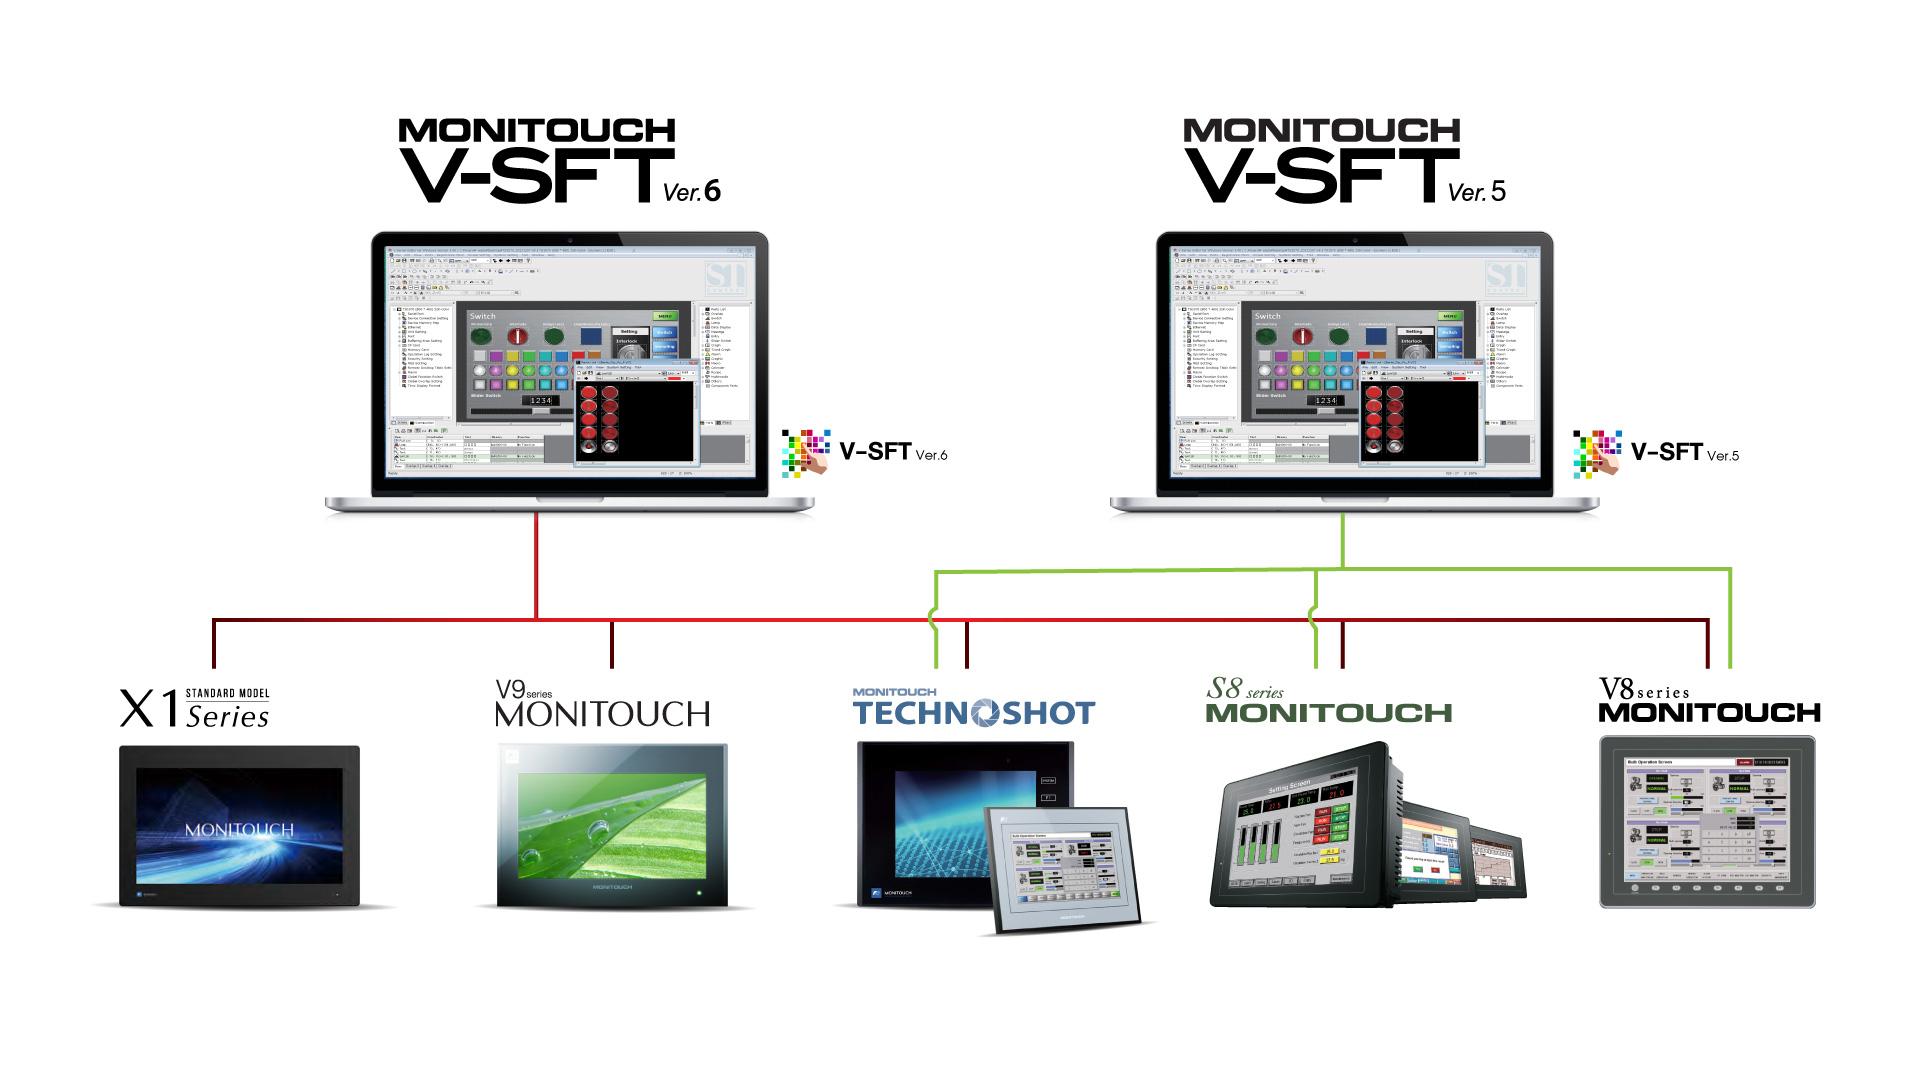 Fuji Electric V SFT v6 V SFT v5 Software LineUpSeries